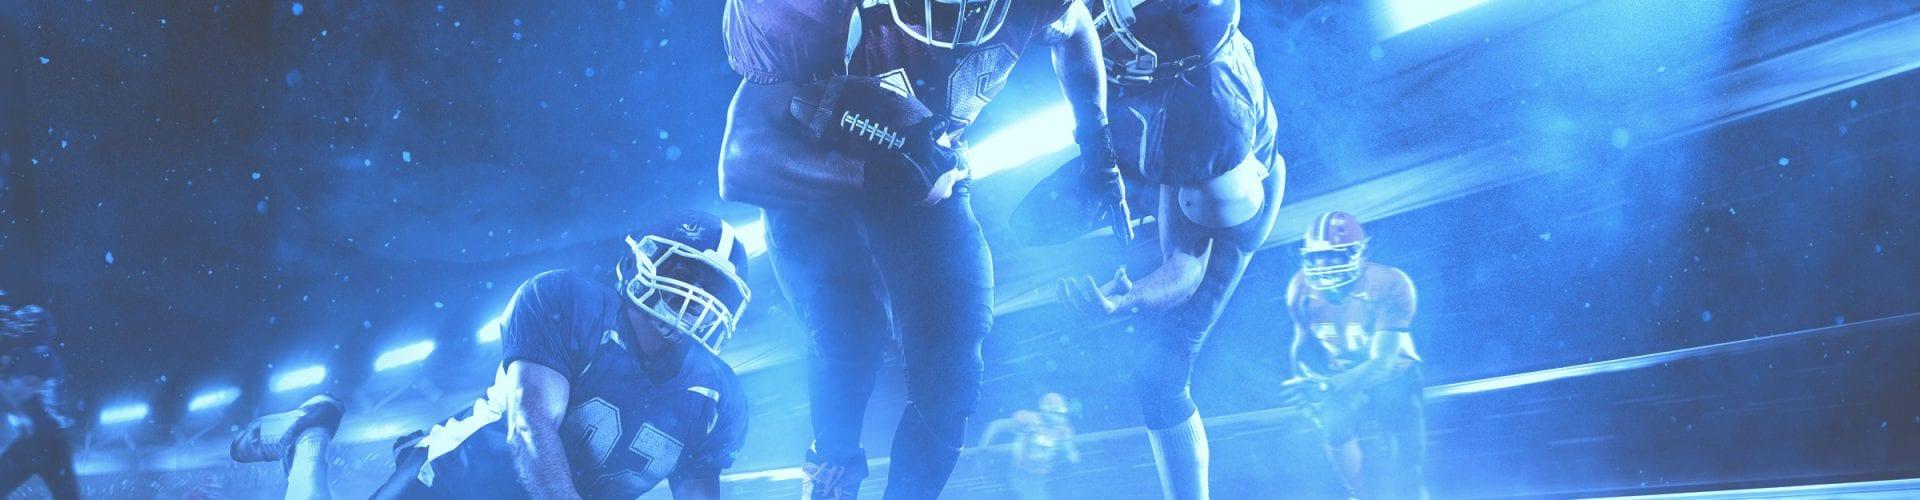 Super Bowl LIII Get In Price – December 28